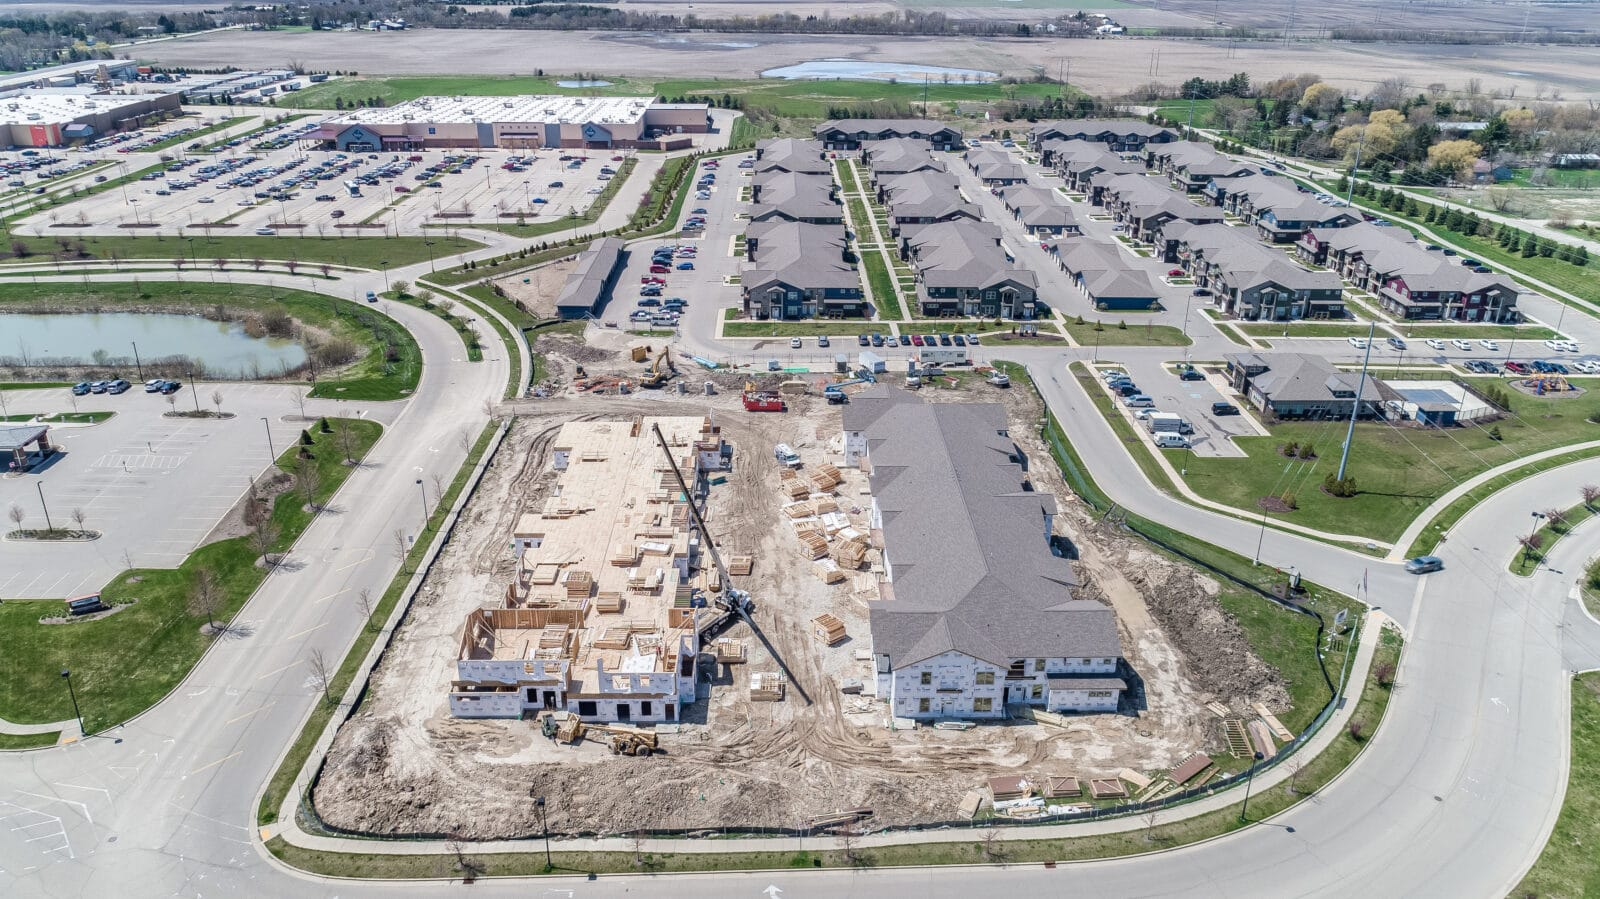 market square apartments, construction management associates, general contractors